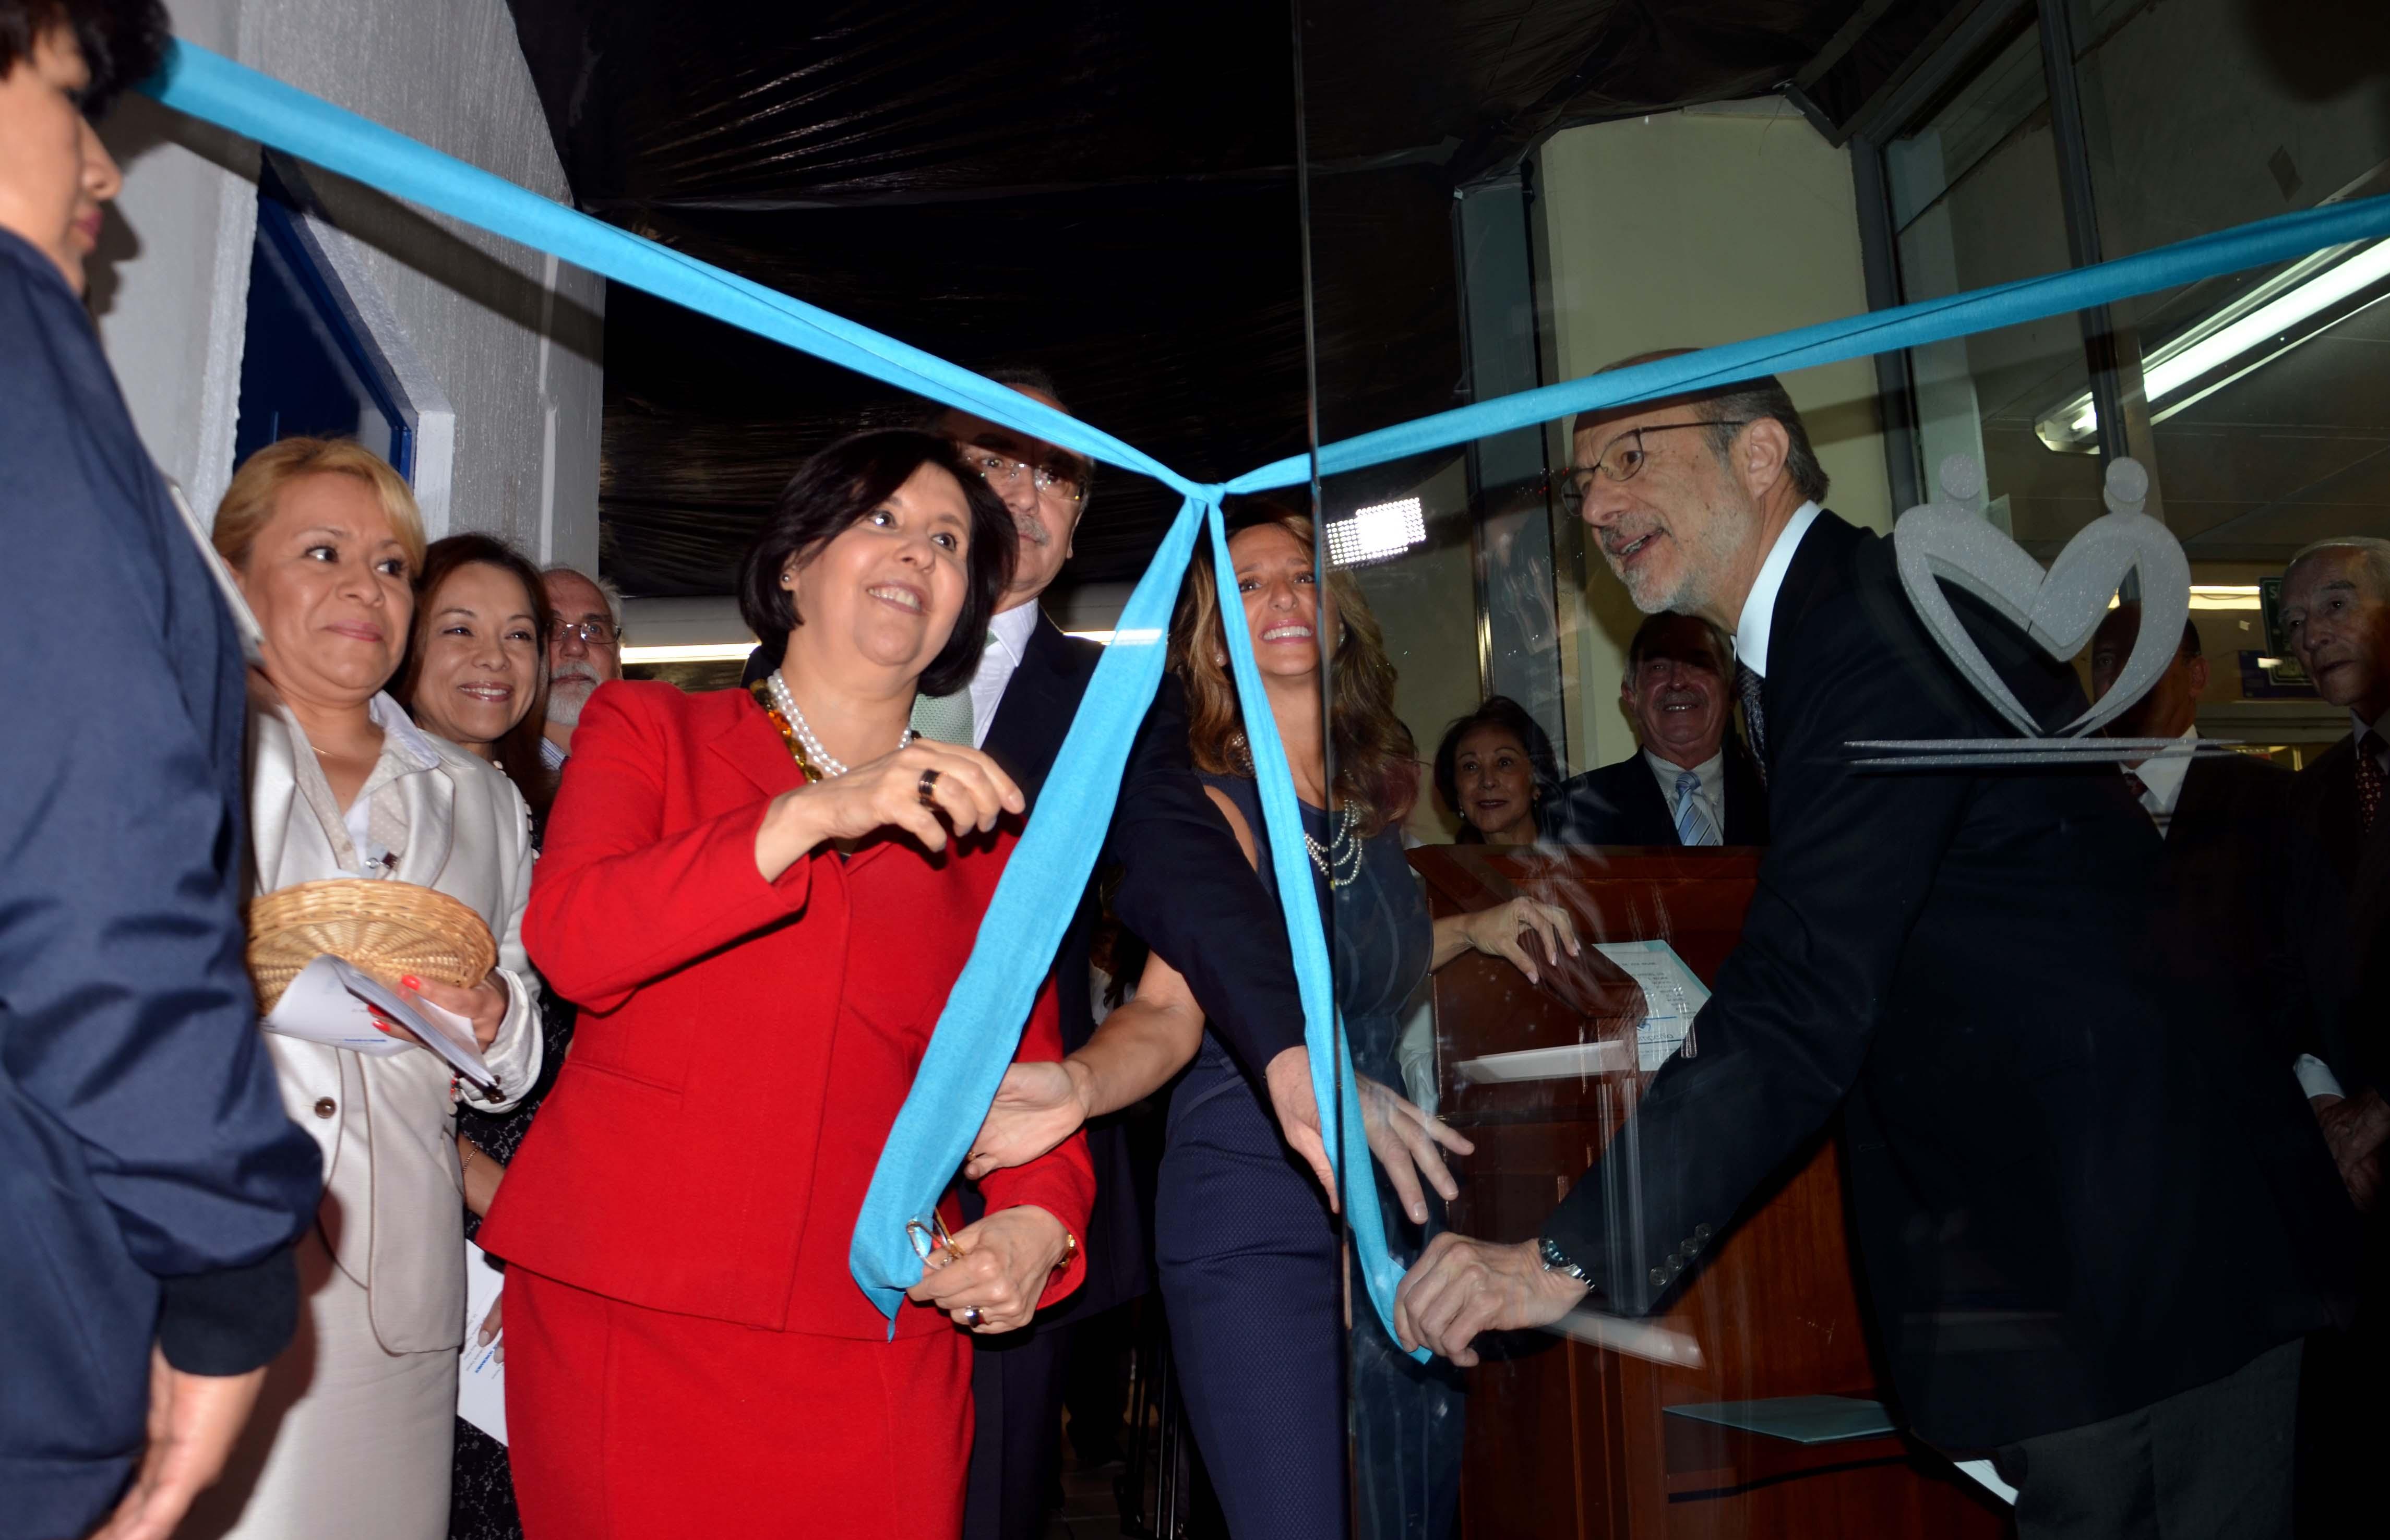 090315 Inauguracion de Sala Fundaci n EnCompa ia 04jpg